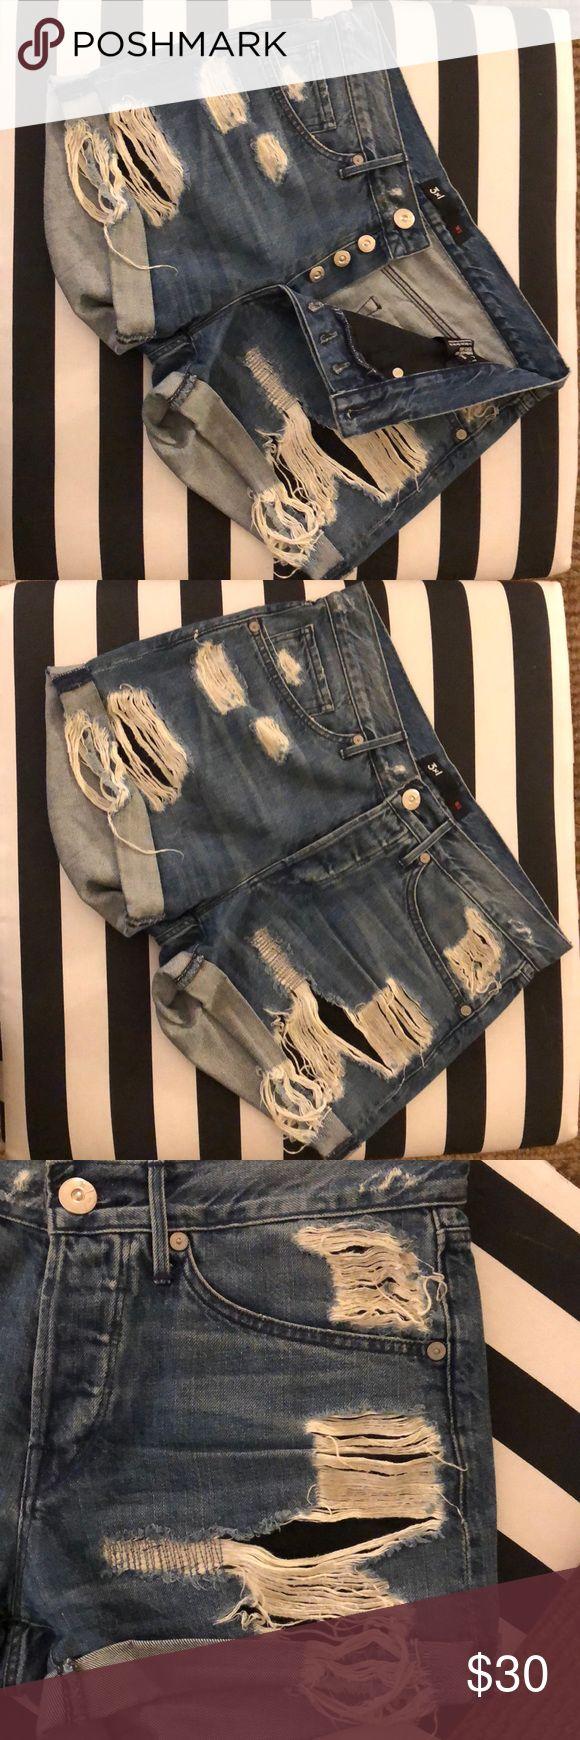 "3x1 denim cutoffs 3x1 denim distressed cutoffs. Black pocket lining to peek through holes on front. Cute comfy 100% Cotton. Button up closure. Staple for a wardrobe. 9 1/2"" rise and 3"" inseam 3x1 Shorts Jean Shorts"